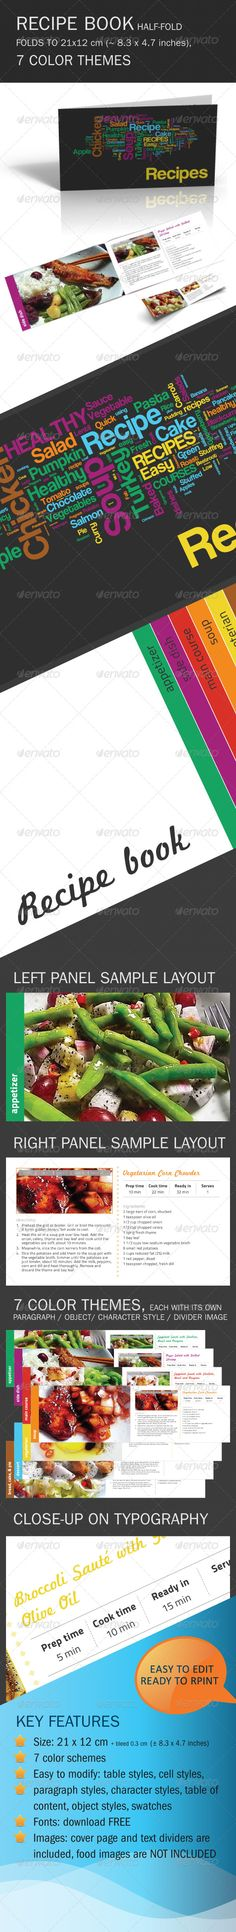 Blank Cookbook: Sweet Pink Pastel Blank Recipe Journal Cover - Bonus Cooking Measurement Inside (Blank Cookbook Recipes & Notes)